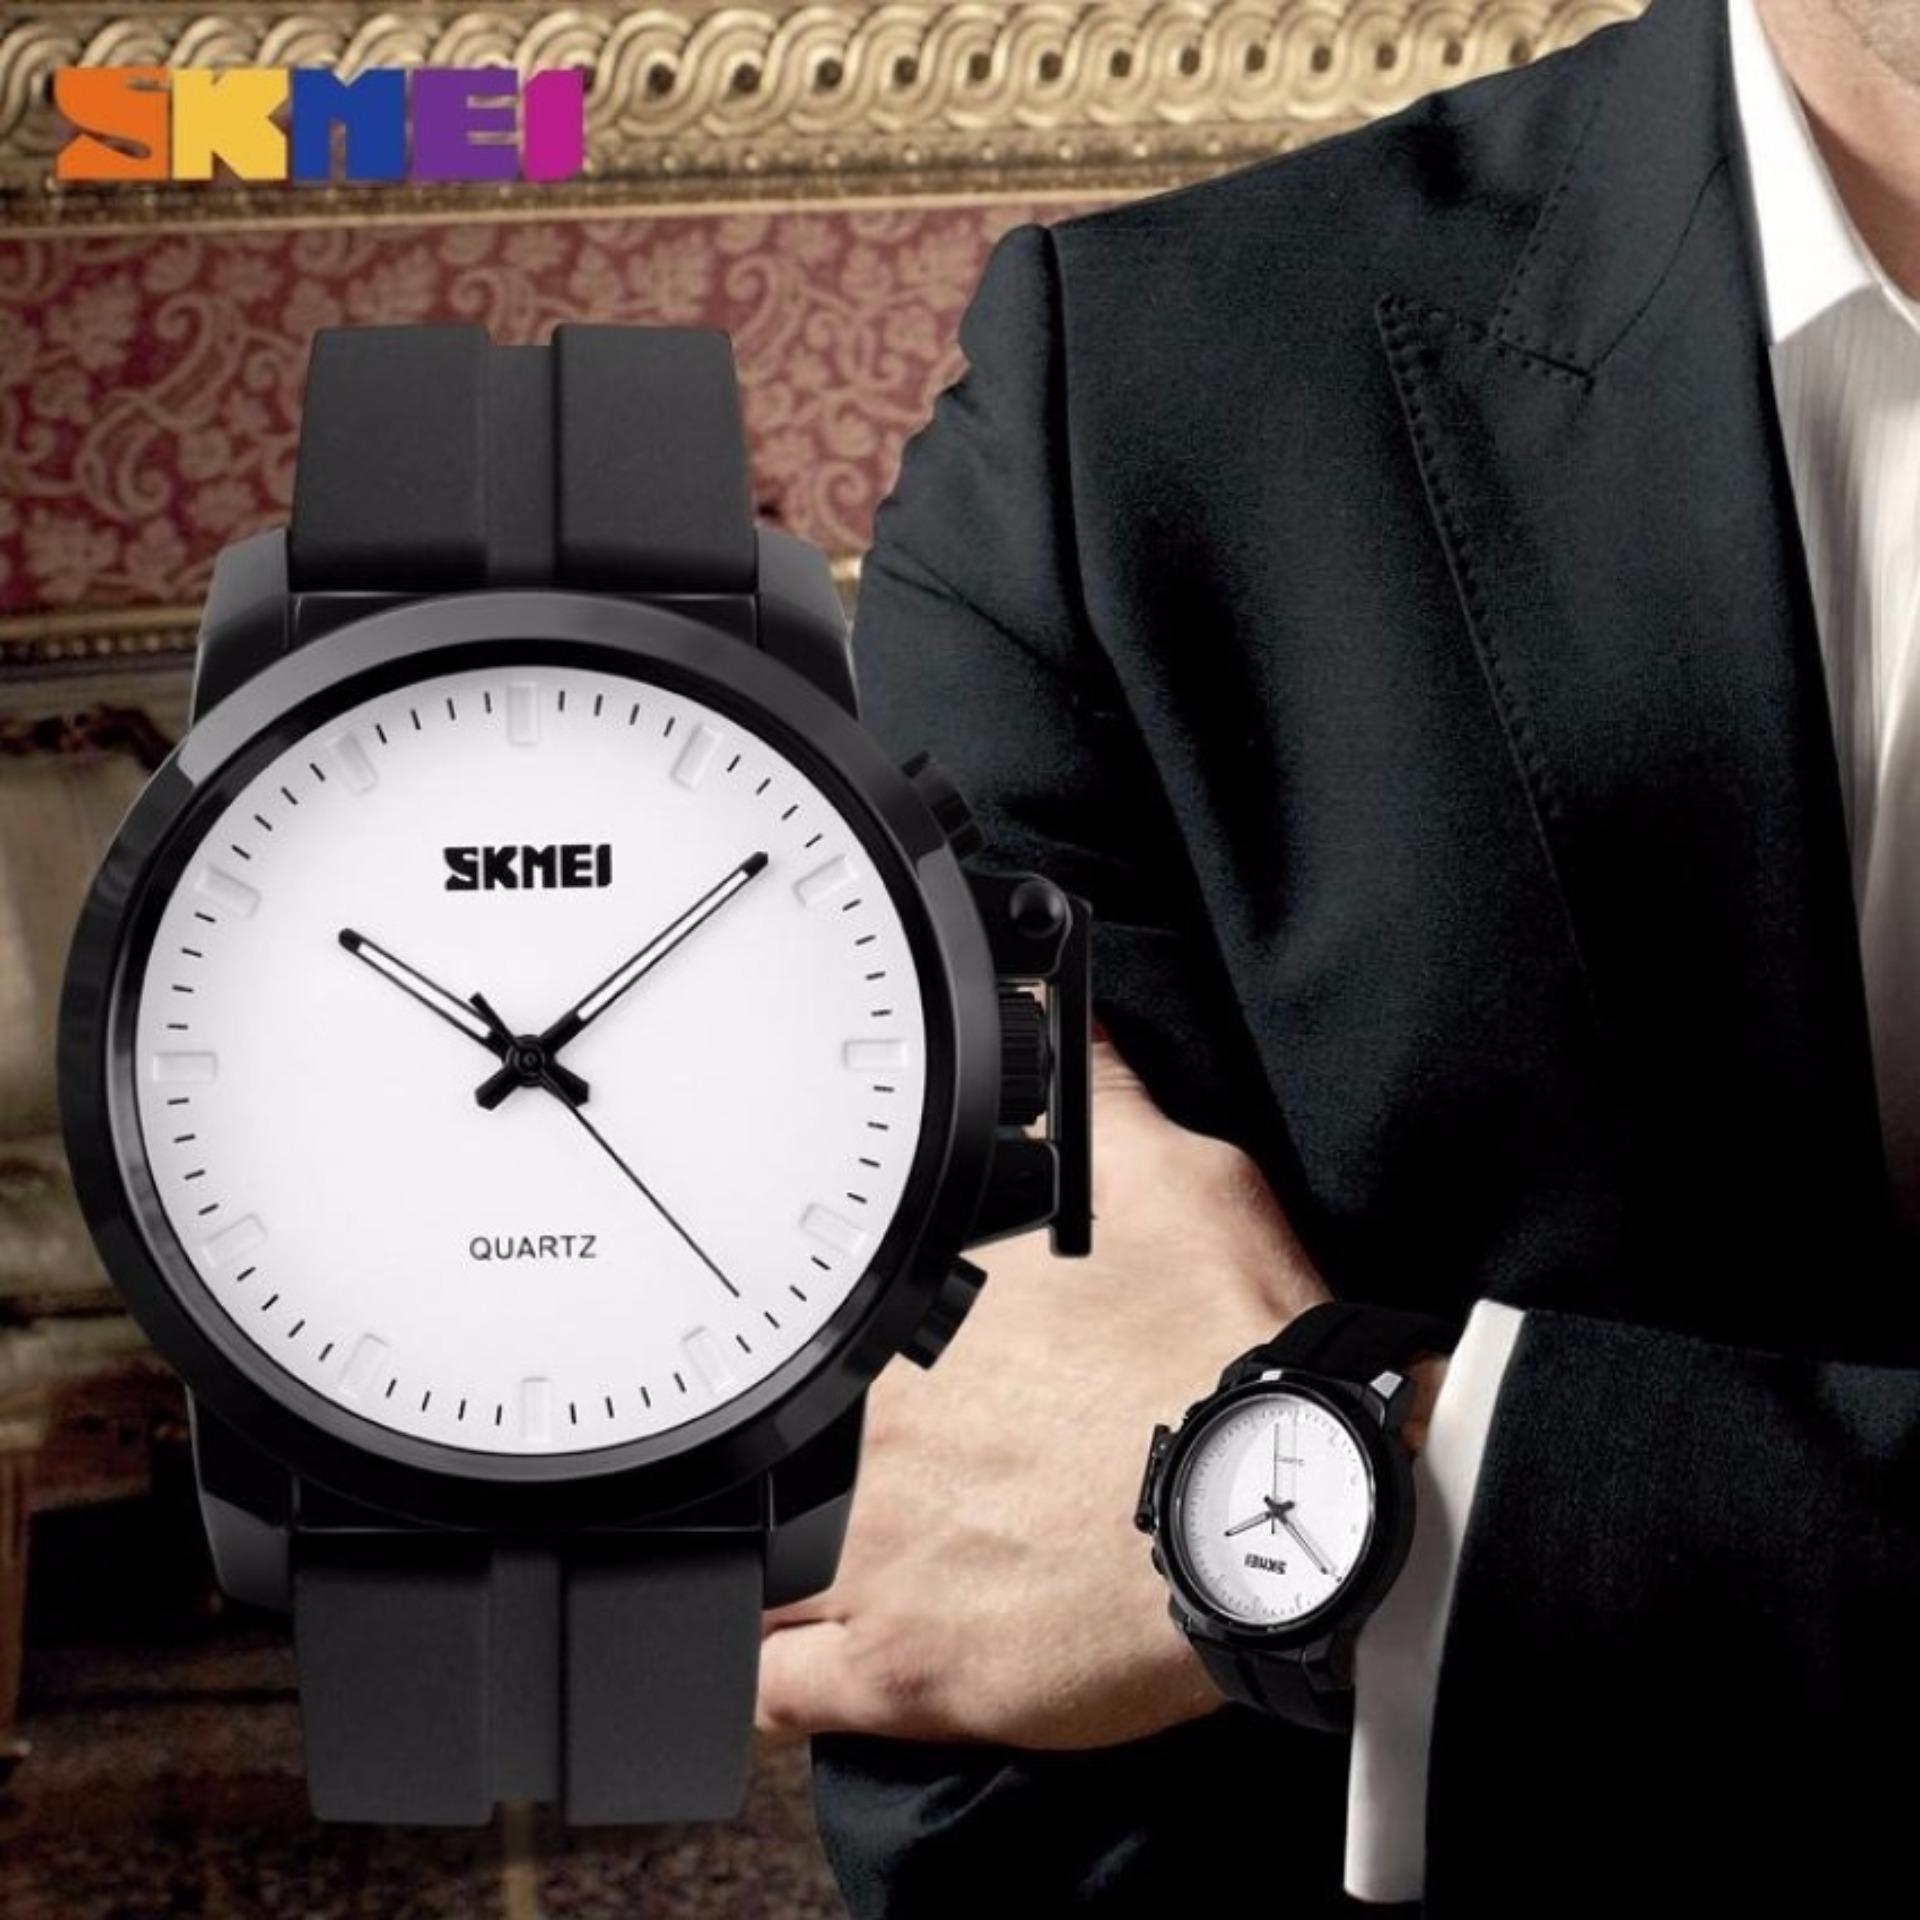 Skmei Jam Tangan Analog Pria Men Casual Watch 1208 Tali Karet Water Resistant 30m Silicone Strap Anti